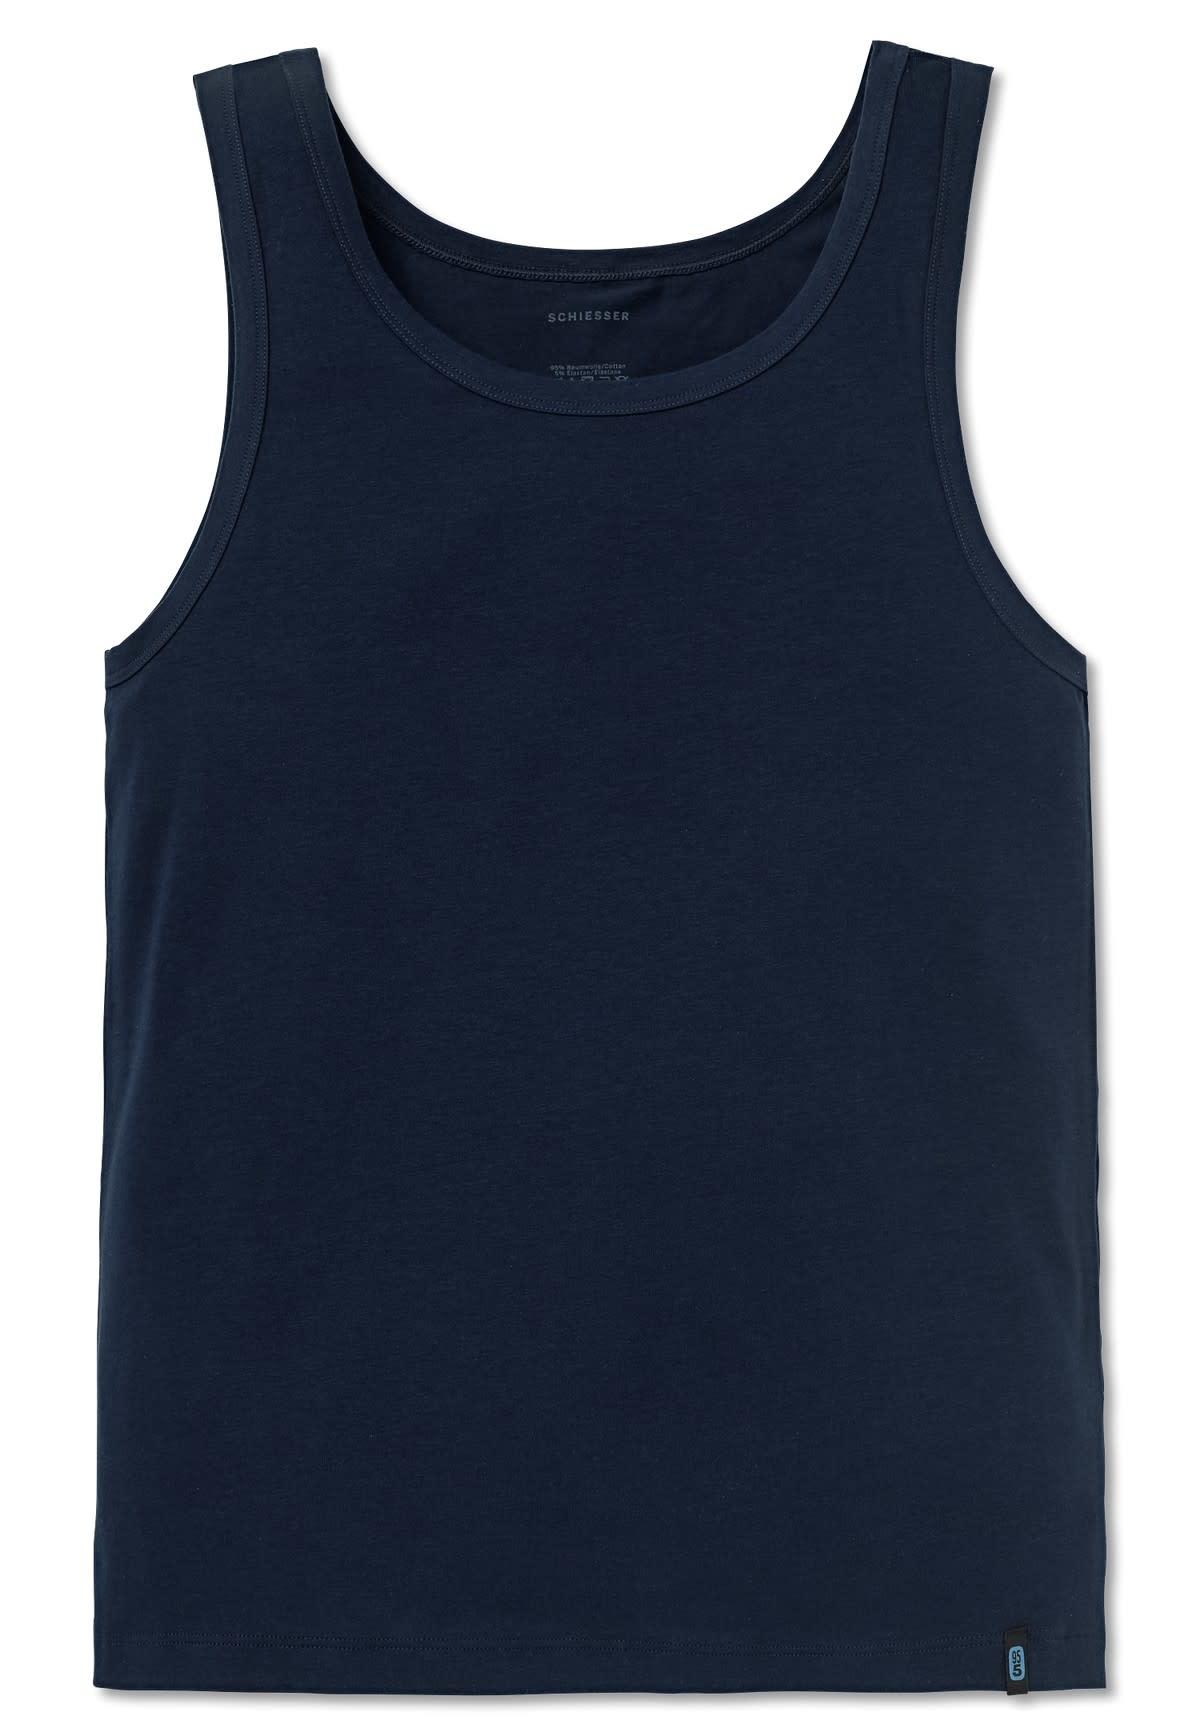 Singlet 95/5 205428 - blauw-3